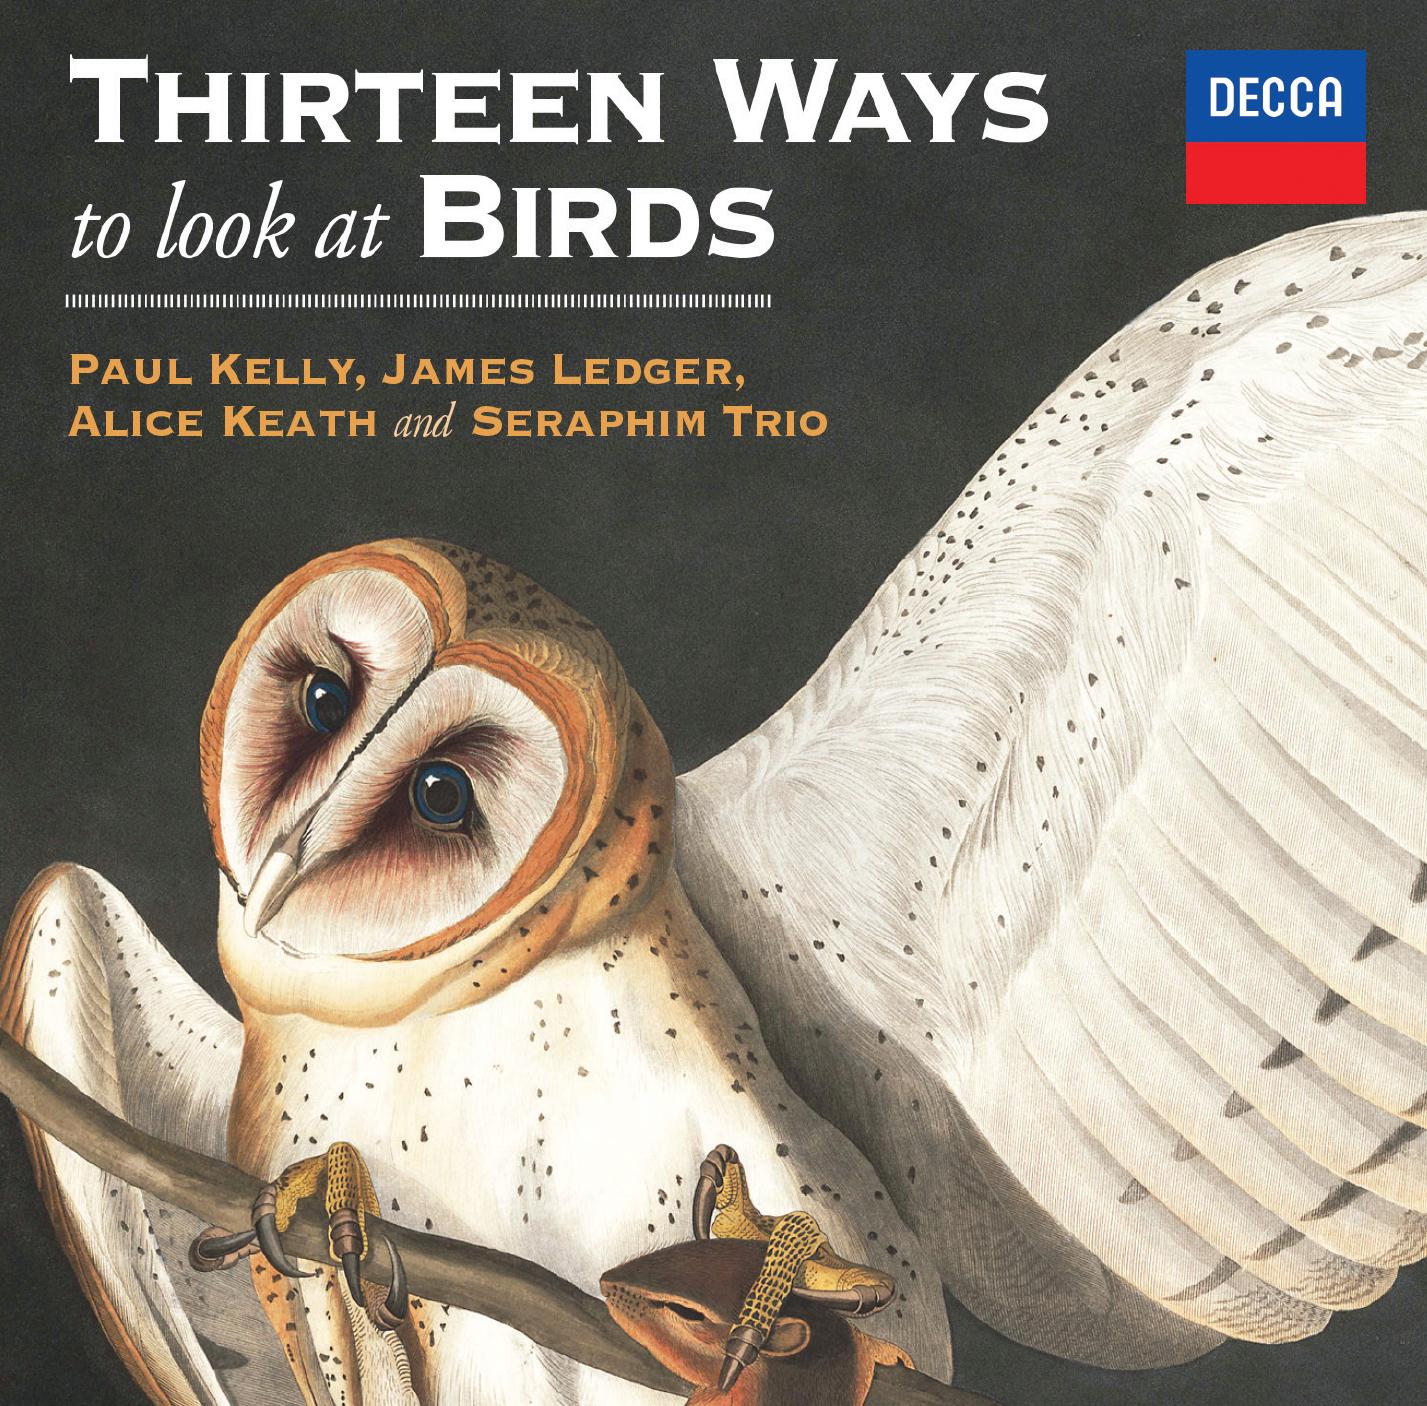 Copy of Thirteen Ways To Look At Birds - 2019